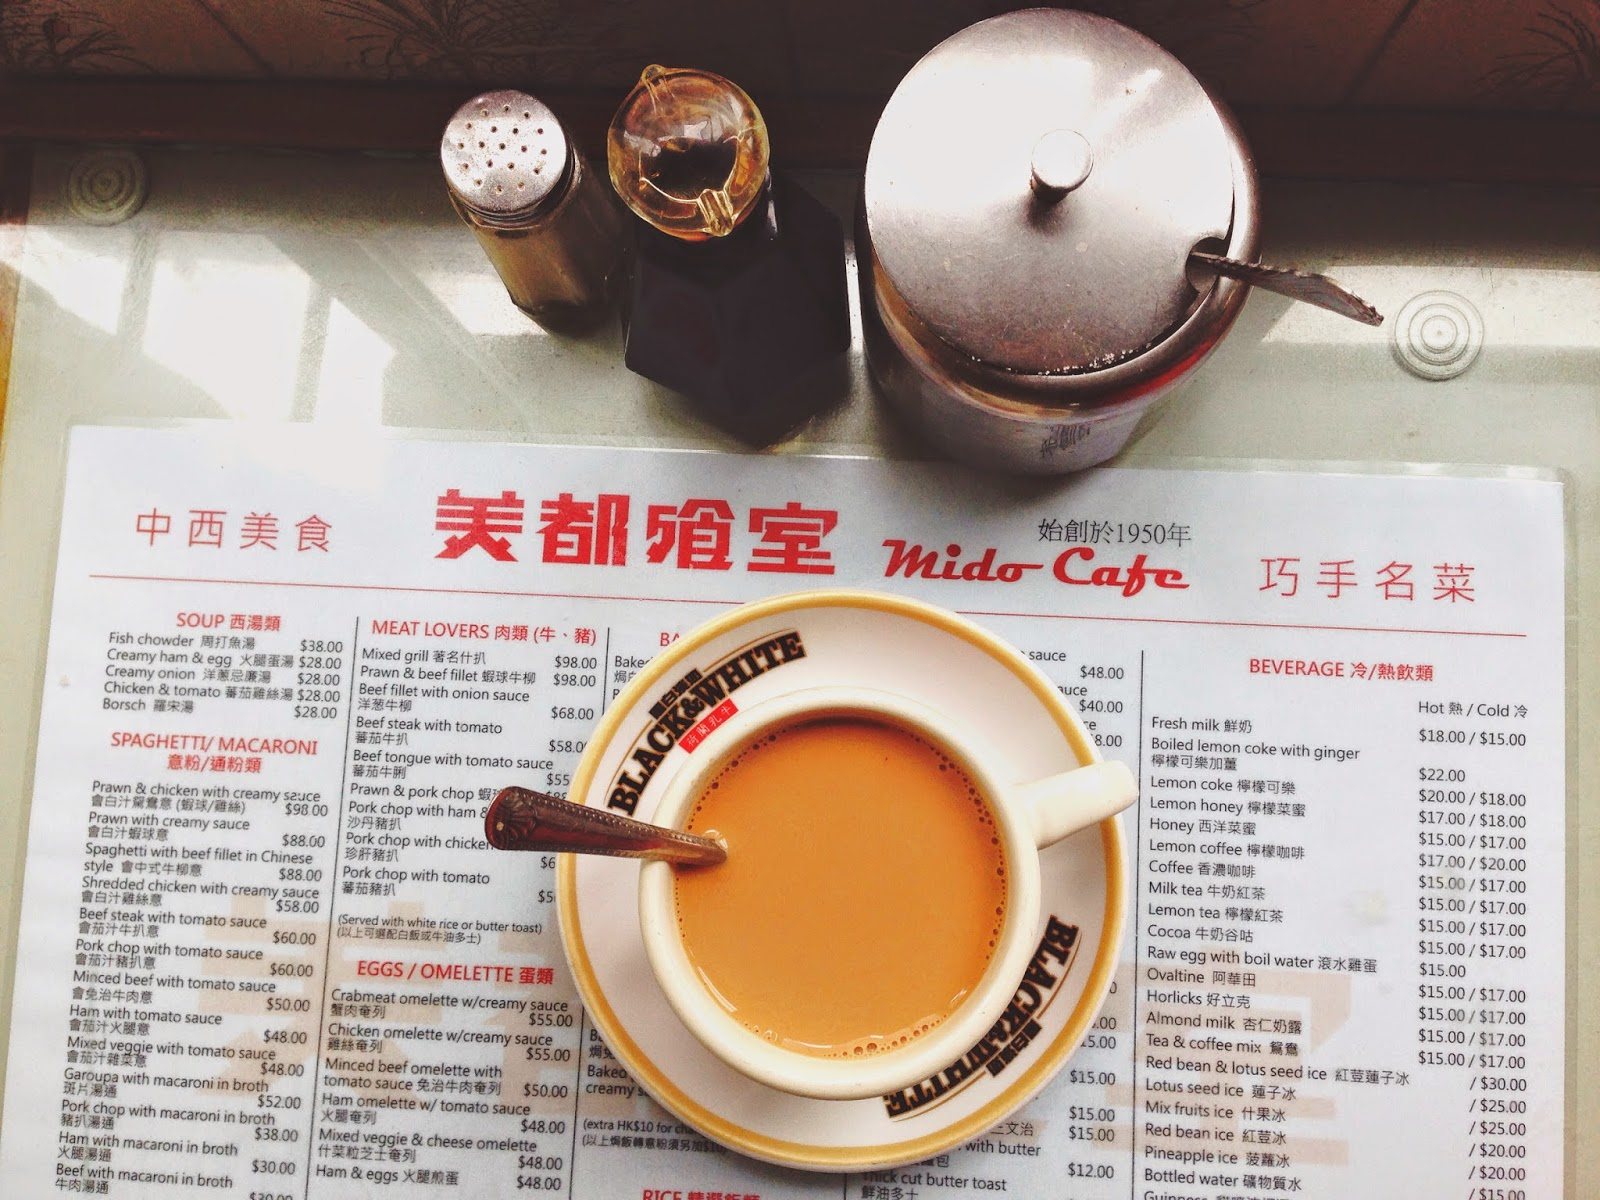 Mido Cafe Hong Kong Menu